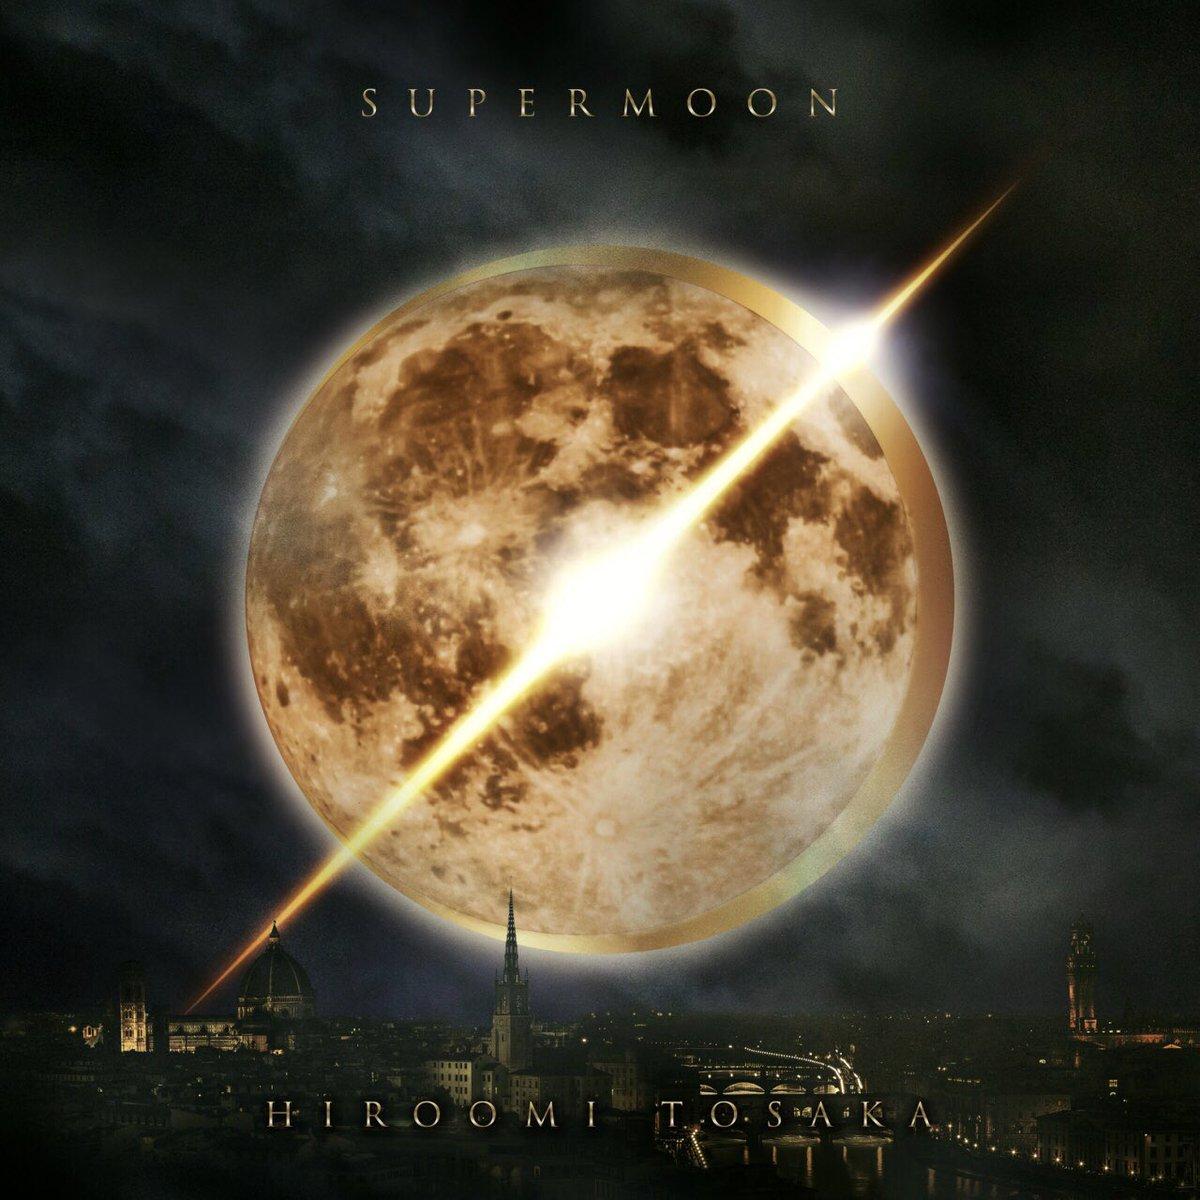 2019 4.10 『SUPER MOON』release 『映画 #名探偵コナン 紺青の拳』 主題歌 #BLUESAPPHIRE ・SUPER MOON ・BLUE SAPPHIRE and more....